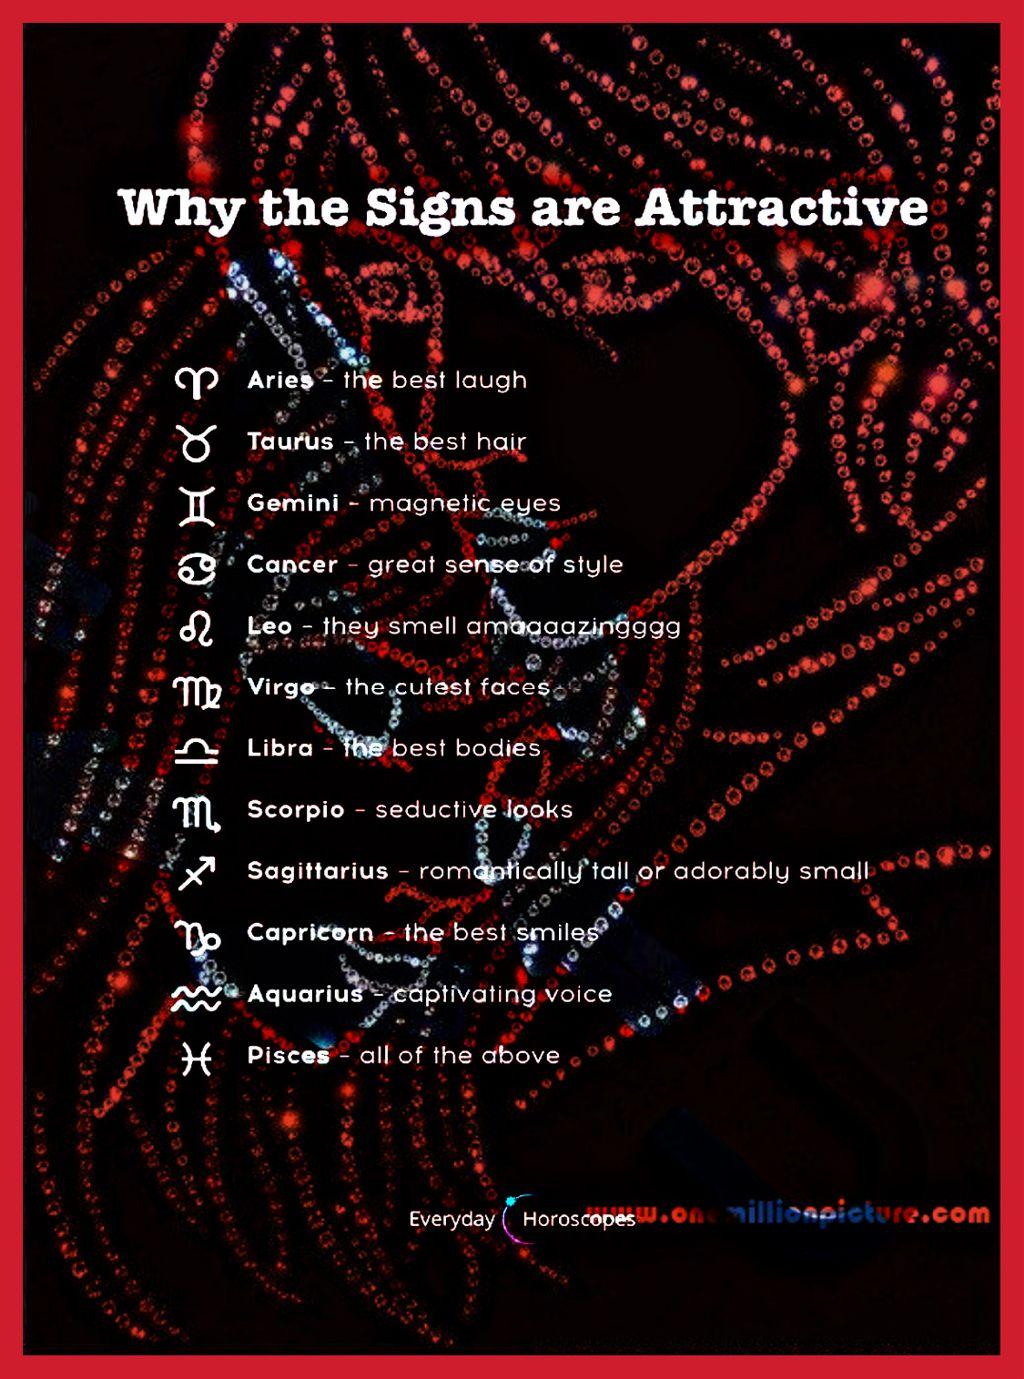 #freetoedit #attraction #horoscope #couple #doubleexposure #text #list #quotesandsayings #art #jewels #border #overlayeffect